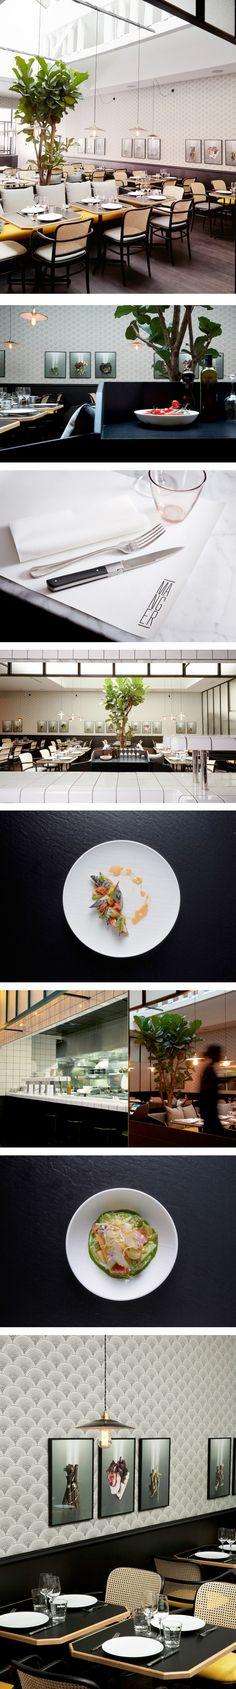 MANGER Restaurant // Architecte Marie Deroudilhe